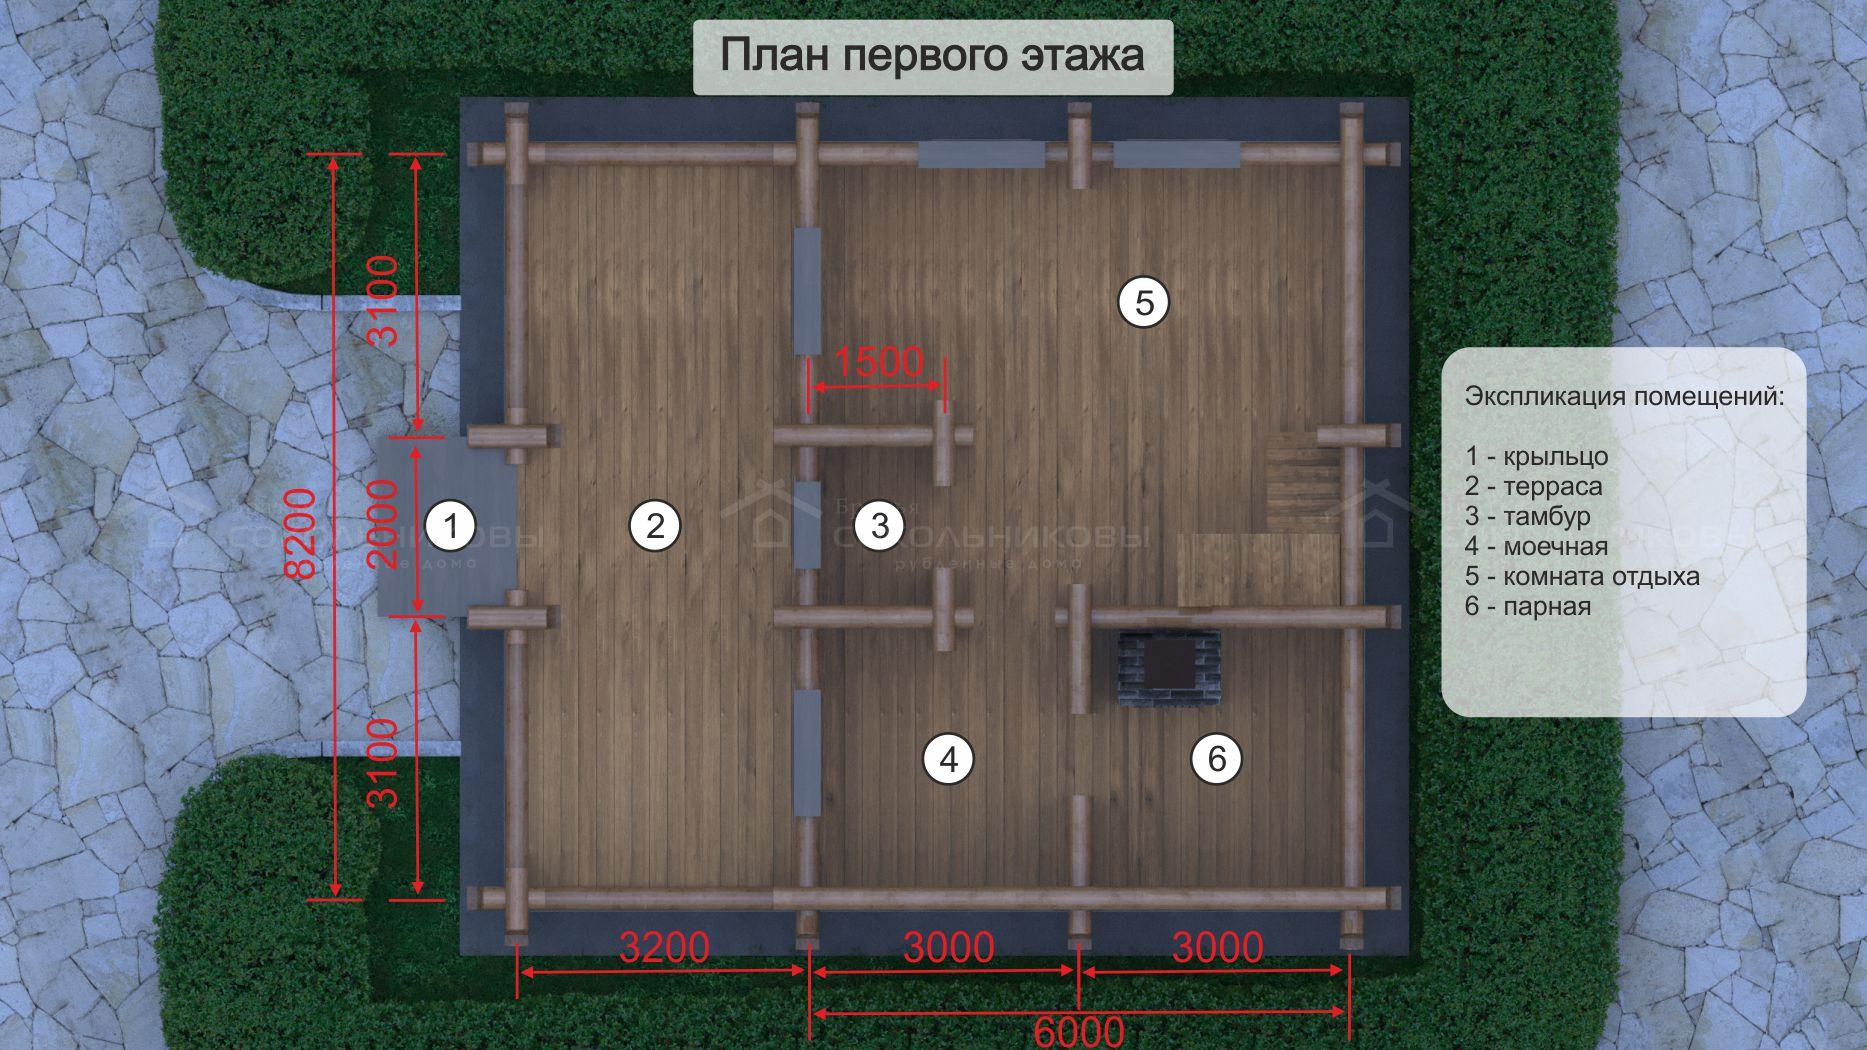 Дом-баня под рубанок, 123 кв. м, фото 8